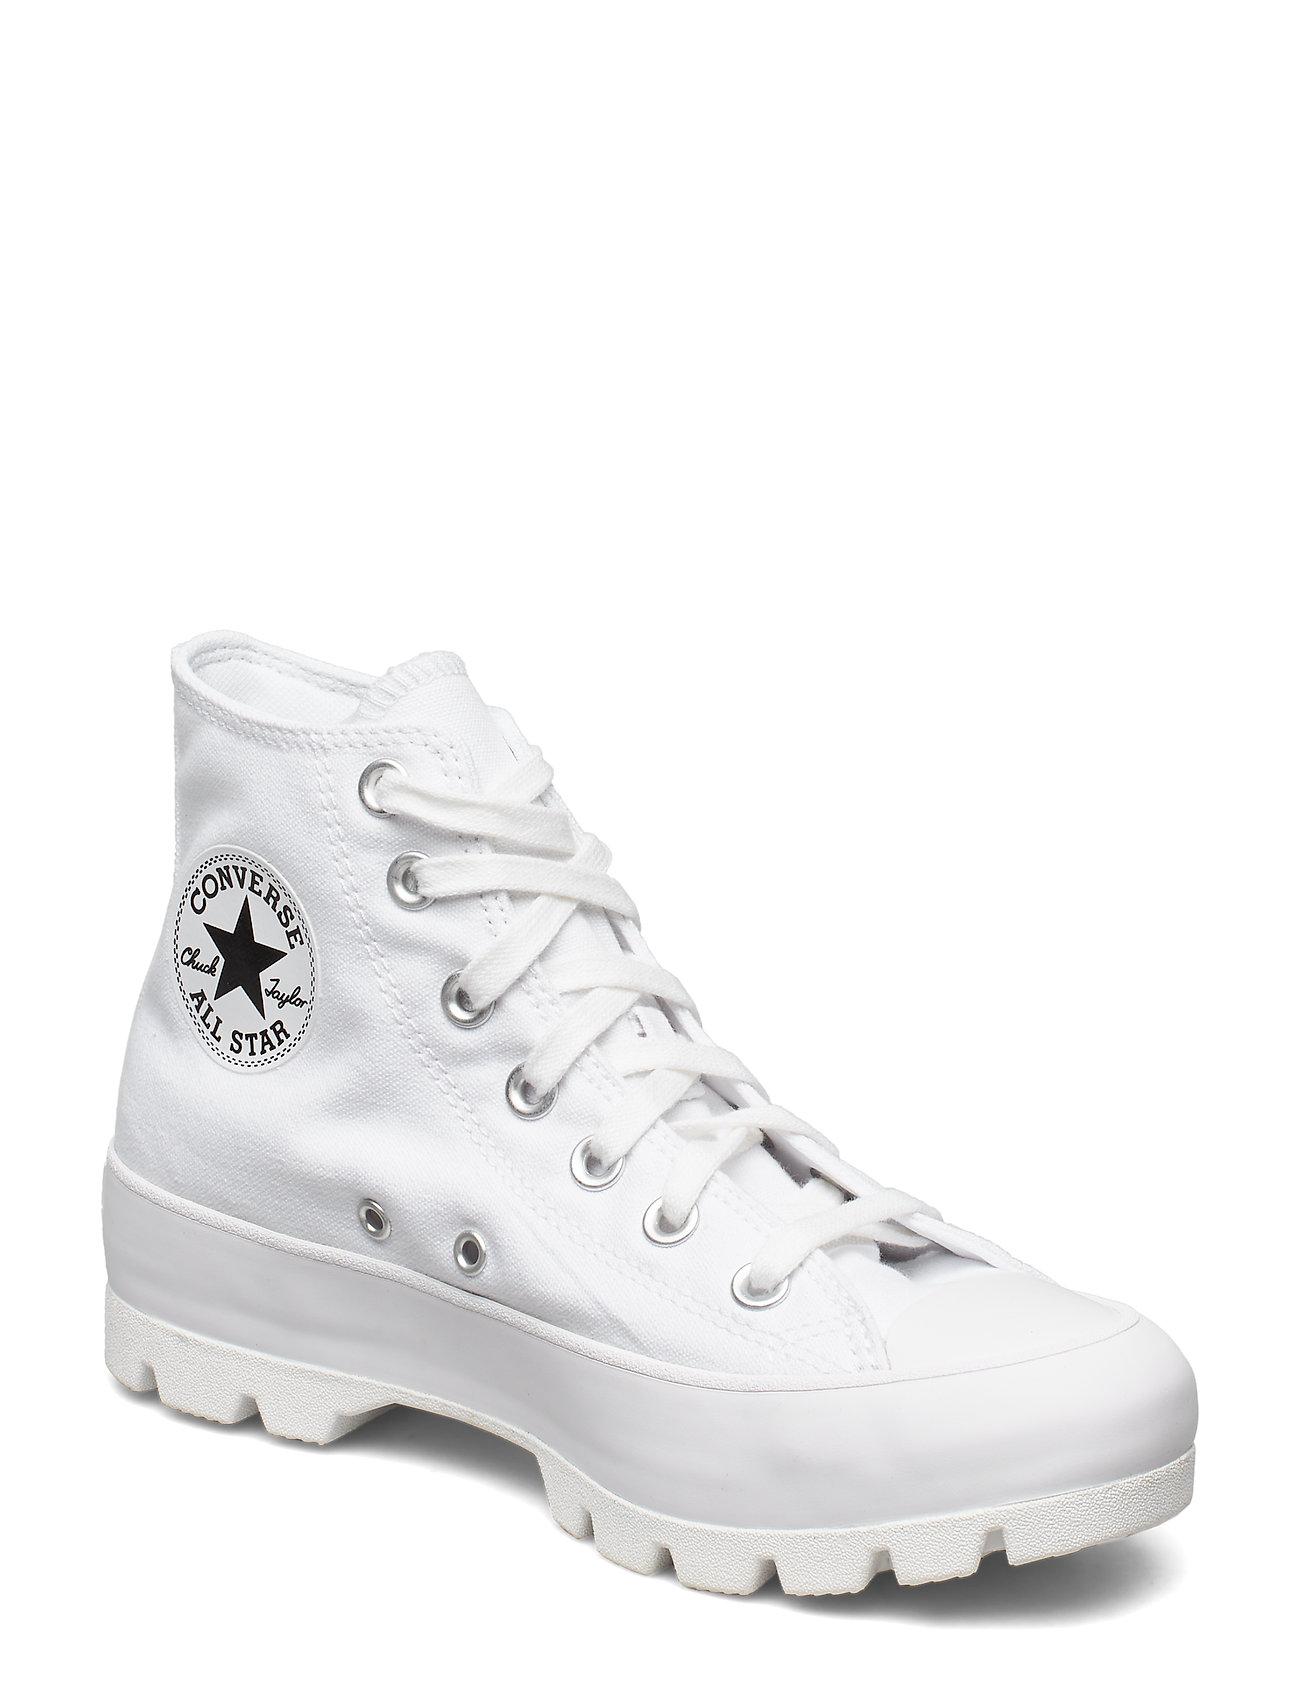 Image of Ctas Lugged Hi White/Black/White High-top Sneakers Hvid Converse (3344407463)